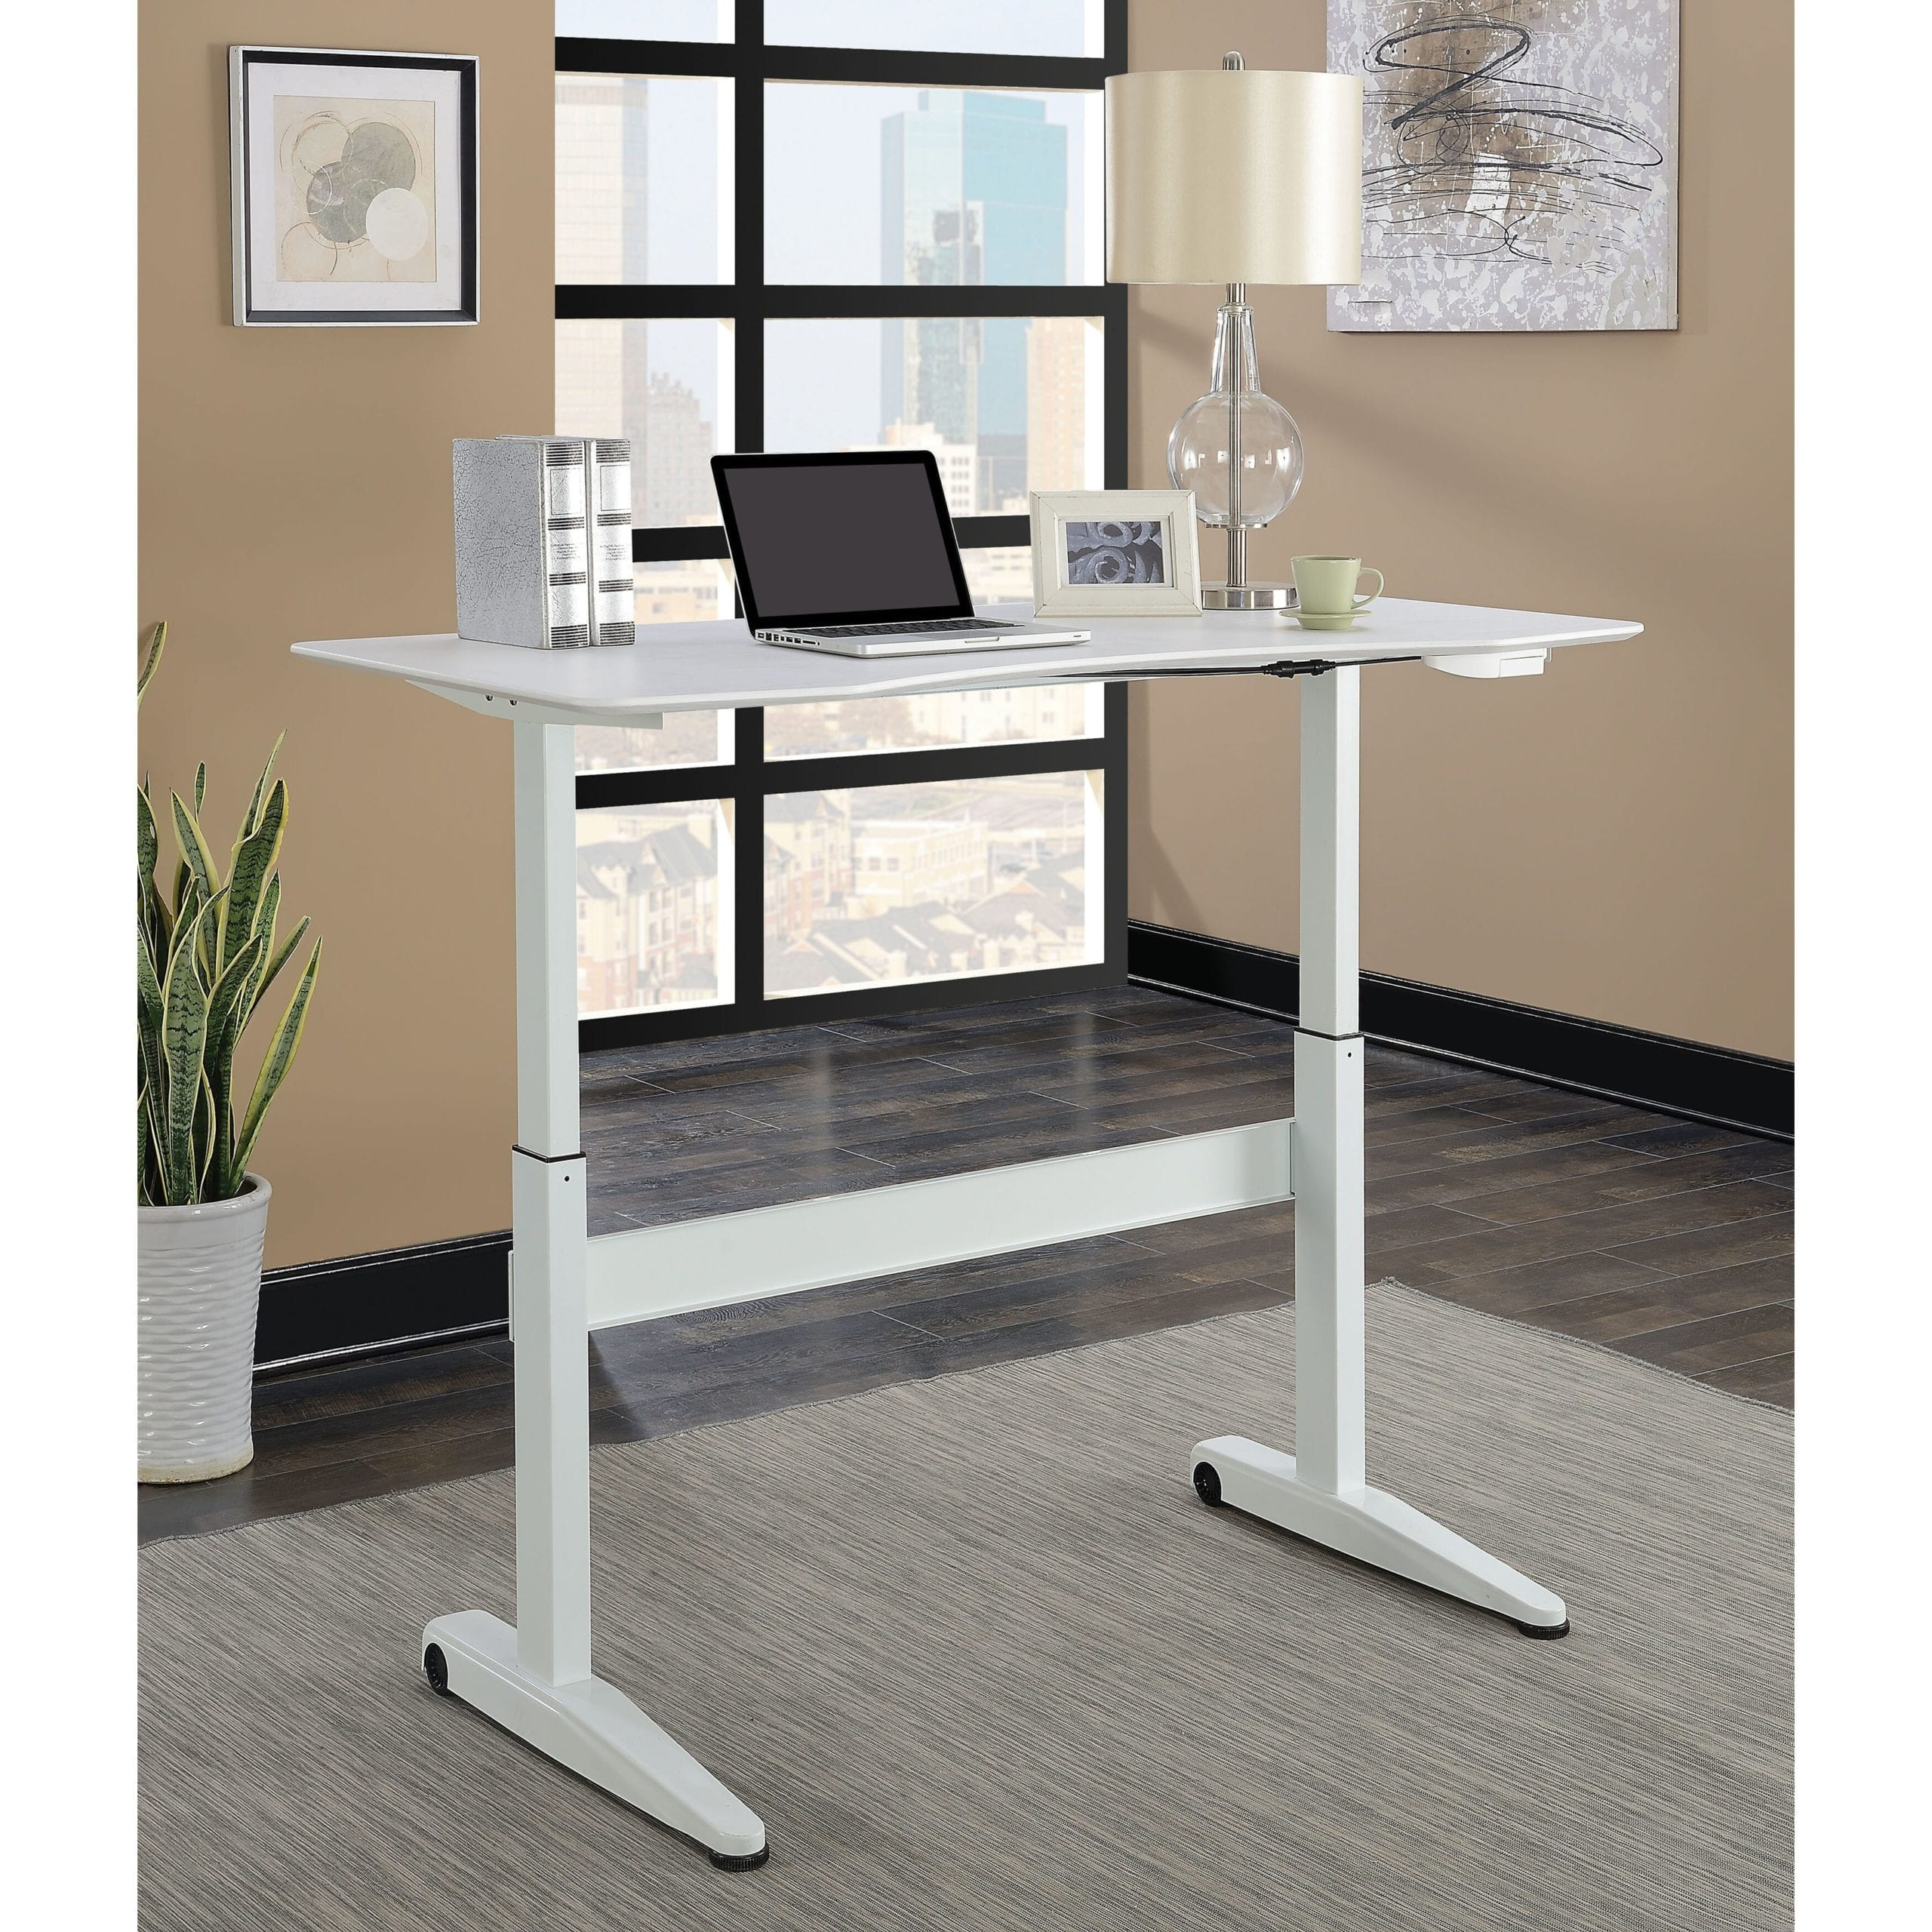 Furniture of America Glidene Modern 59 inch Height Adjustable Computer Desk scaled